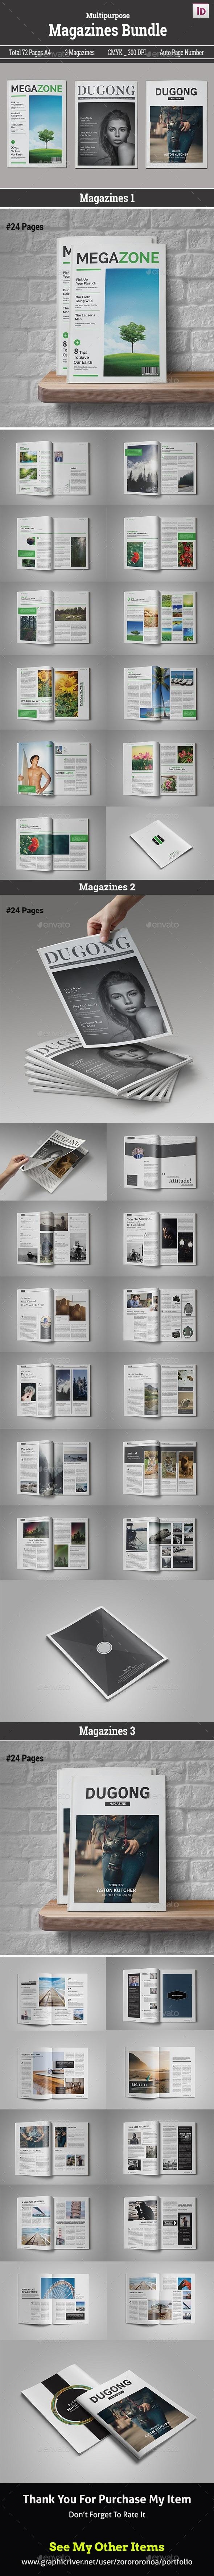 Magazines Bundle Vol.III  — InDesign Template #fashion • Download ➝ https://graphicriver.net/item/magazines-bundle-voliii/18149709?ref=pxcr